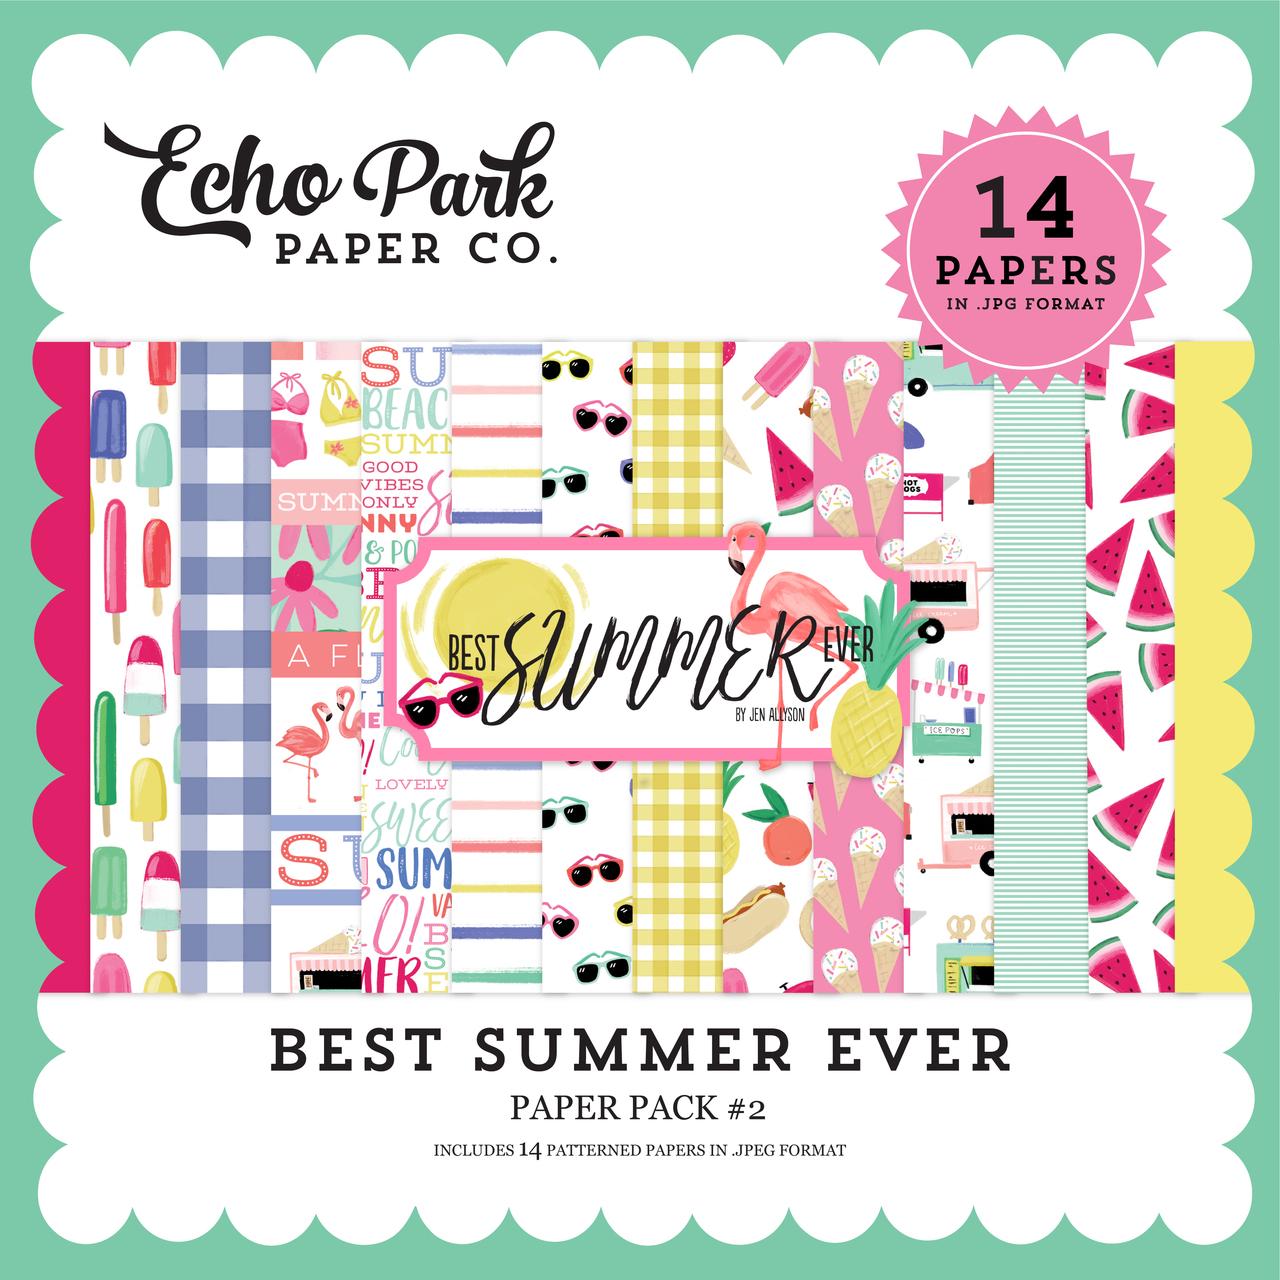 Best Summer Ever Paper Pack #2